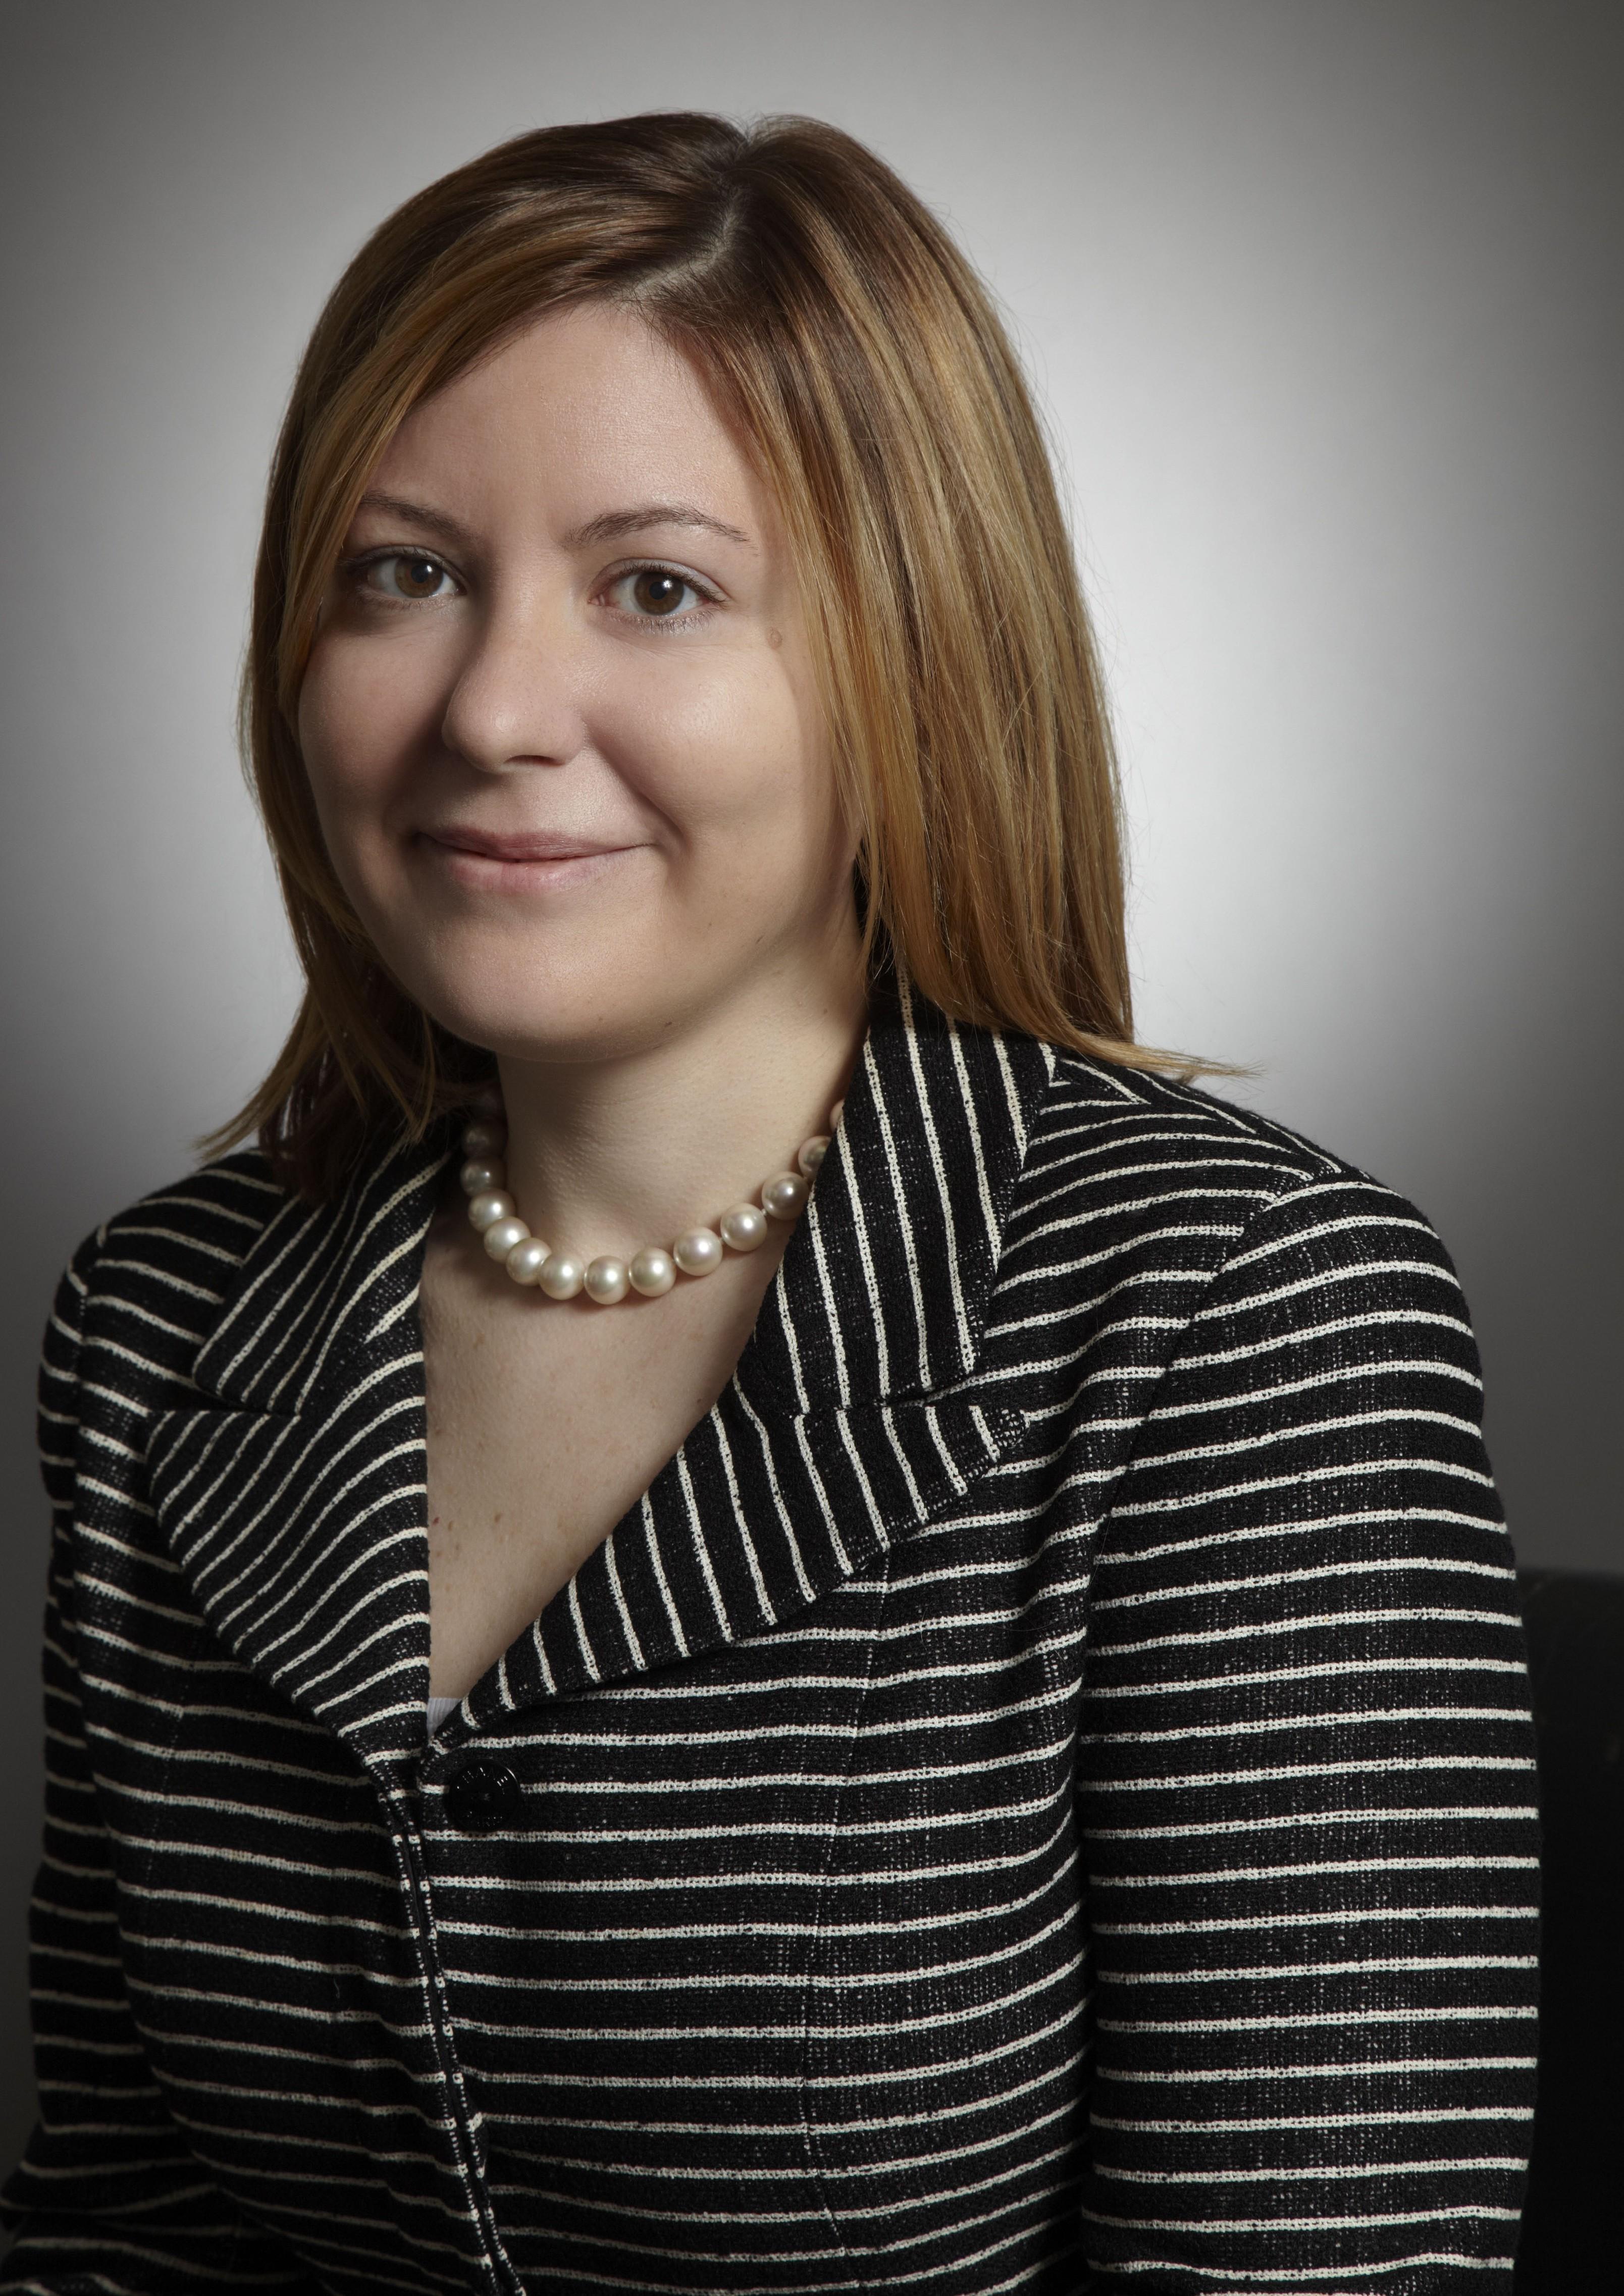 Anna Pinedo